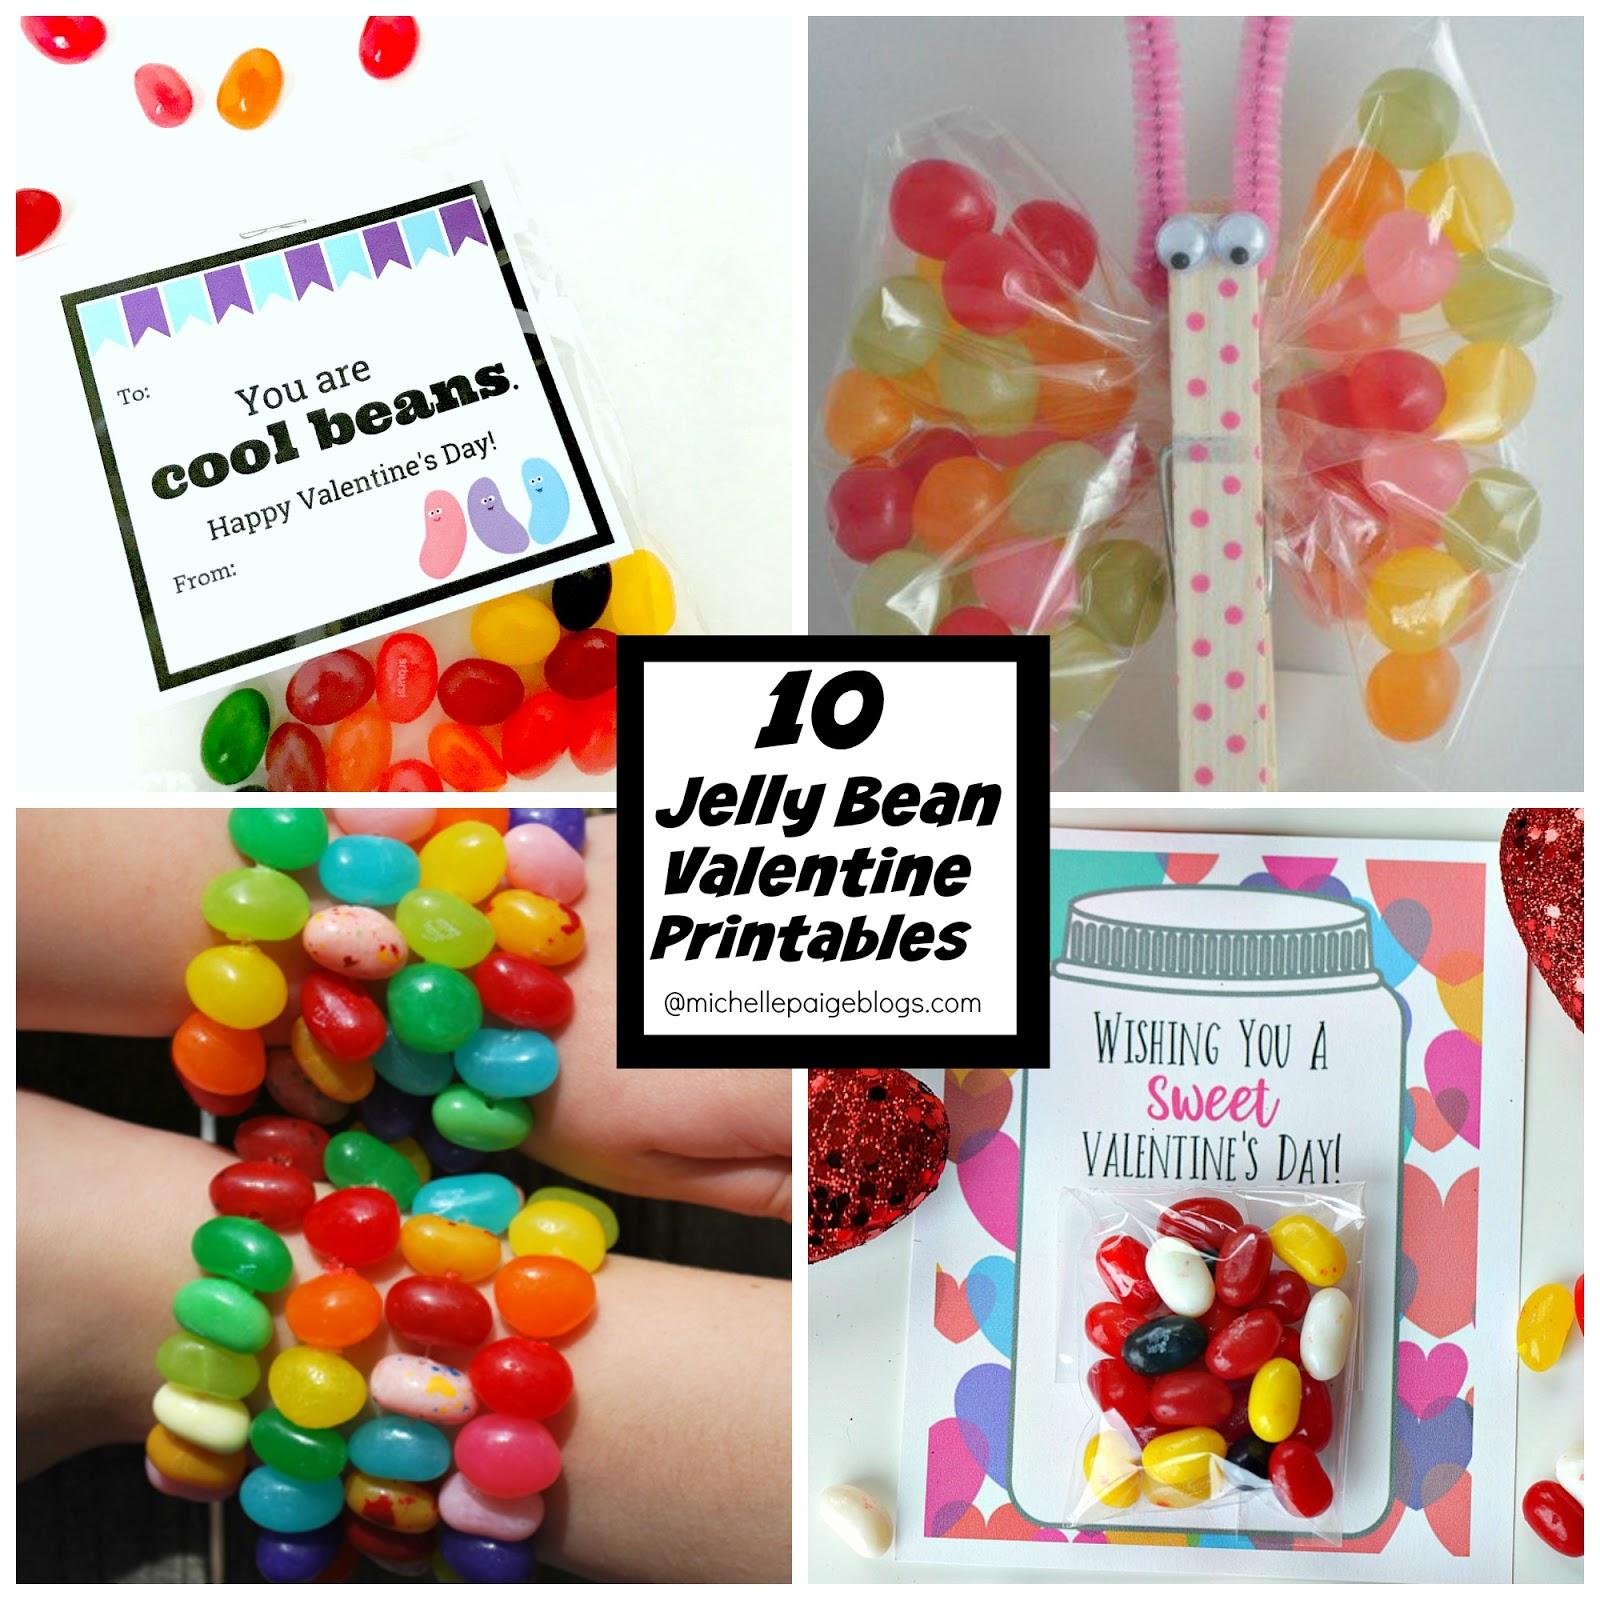 Michelle Paige Blogs 10 Jelly Bean Valentine Printables